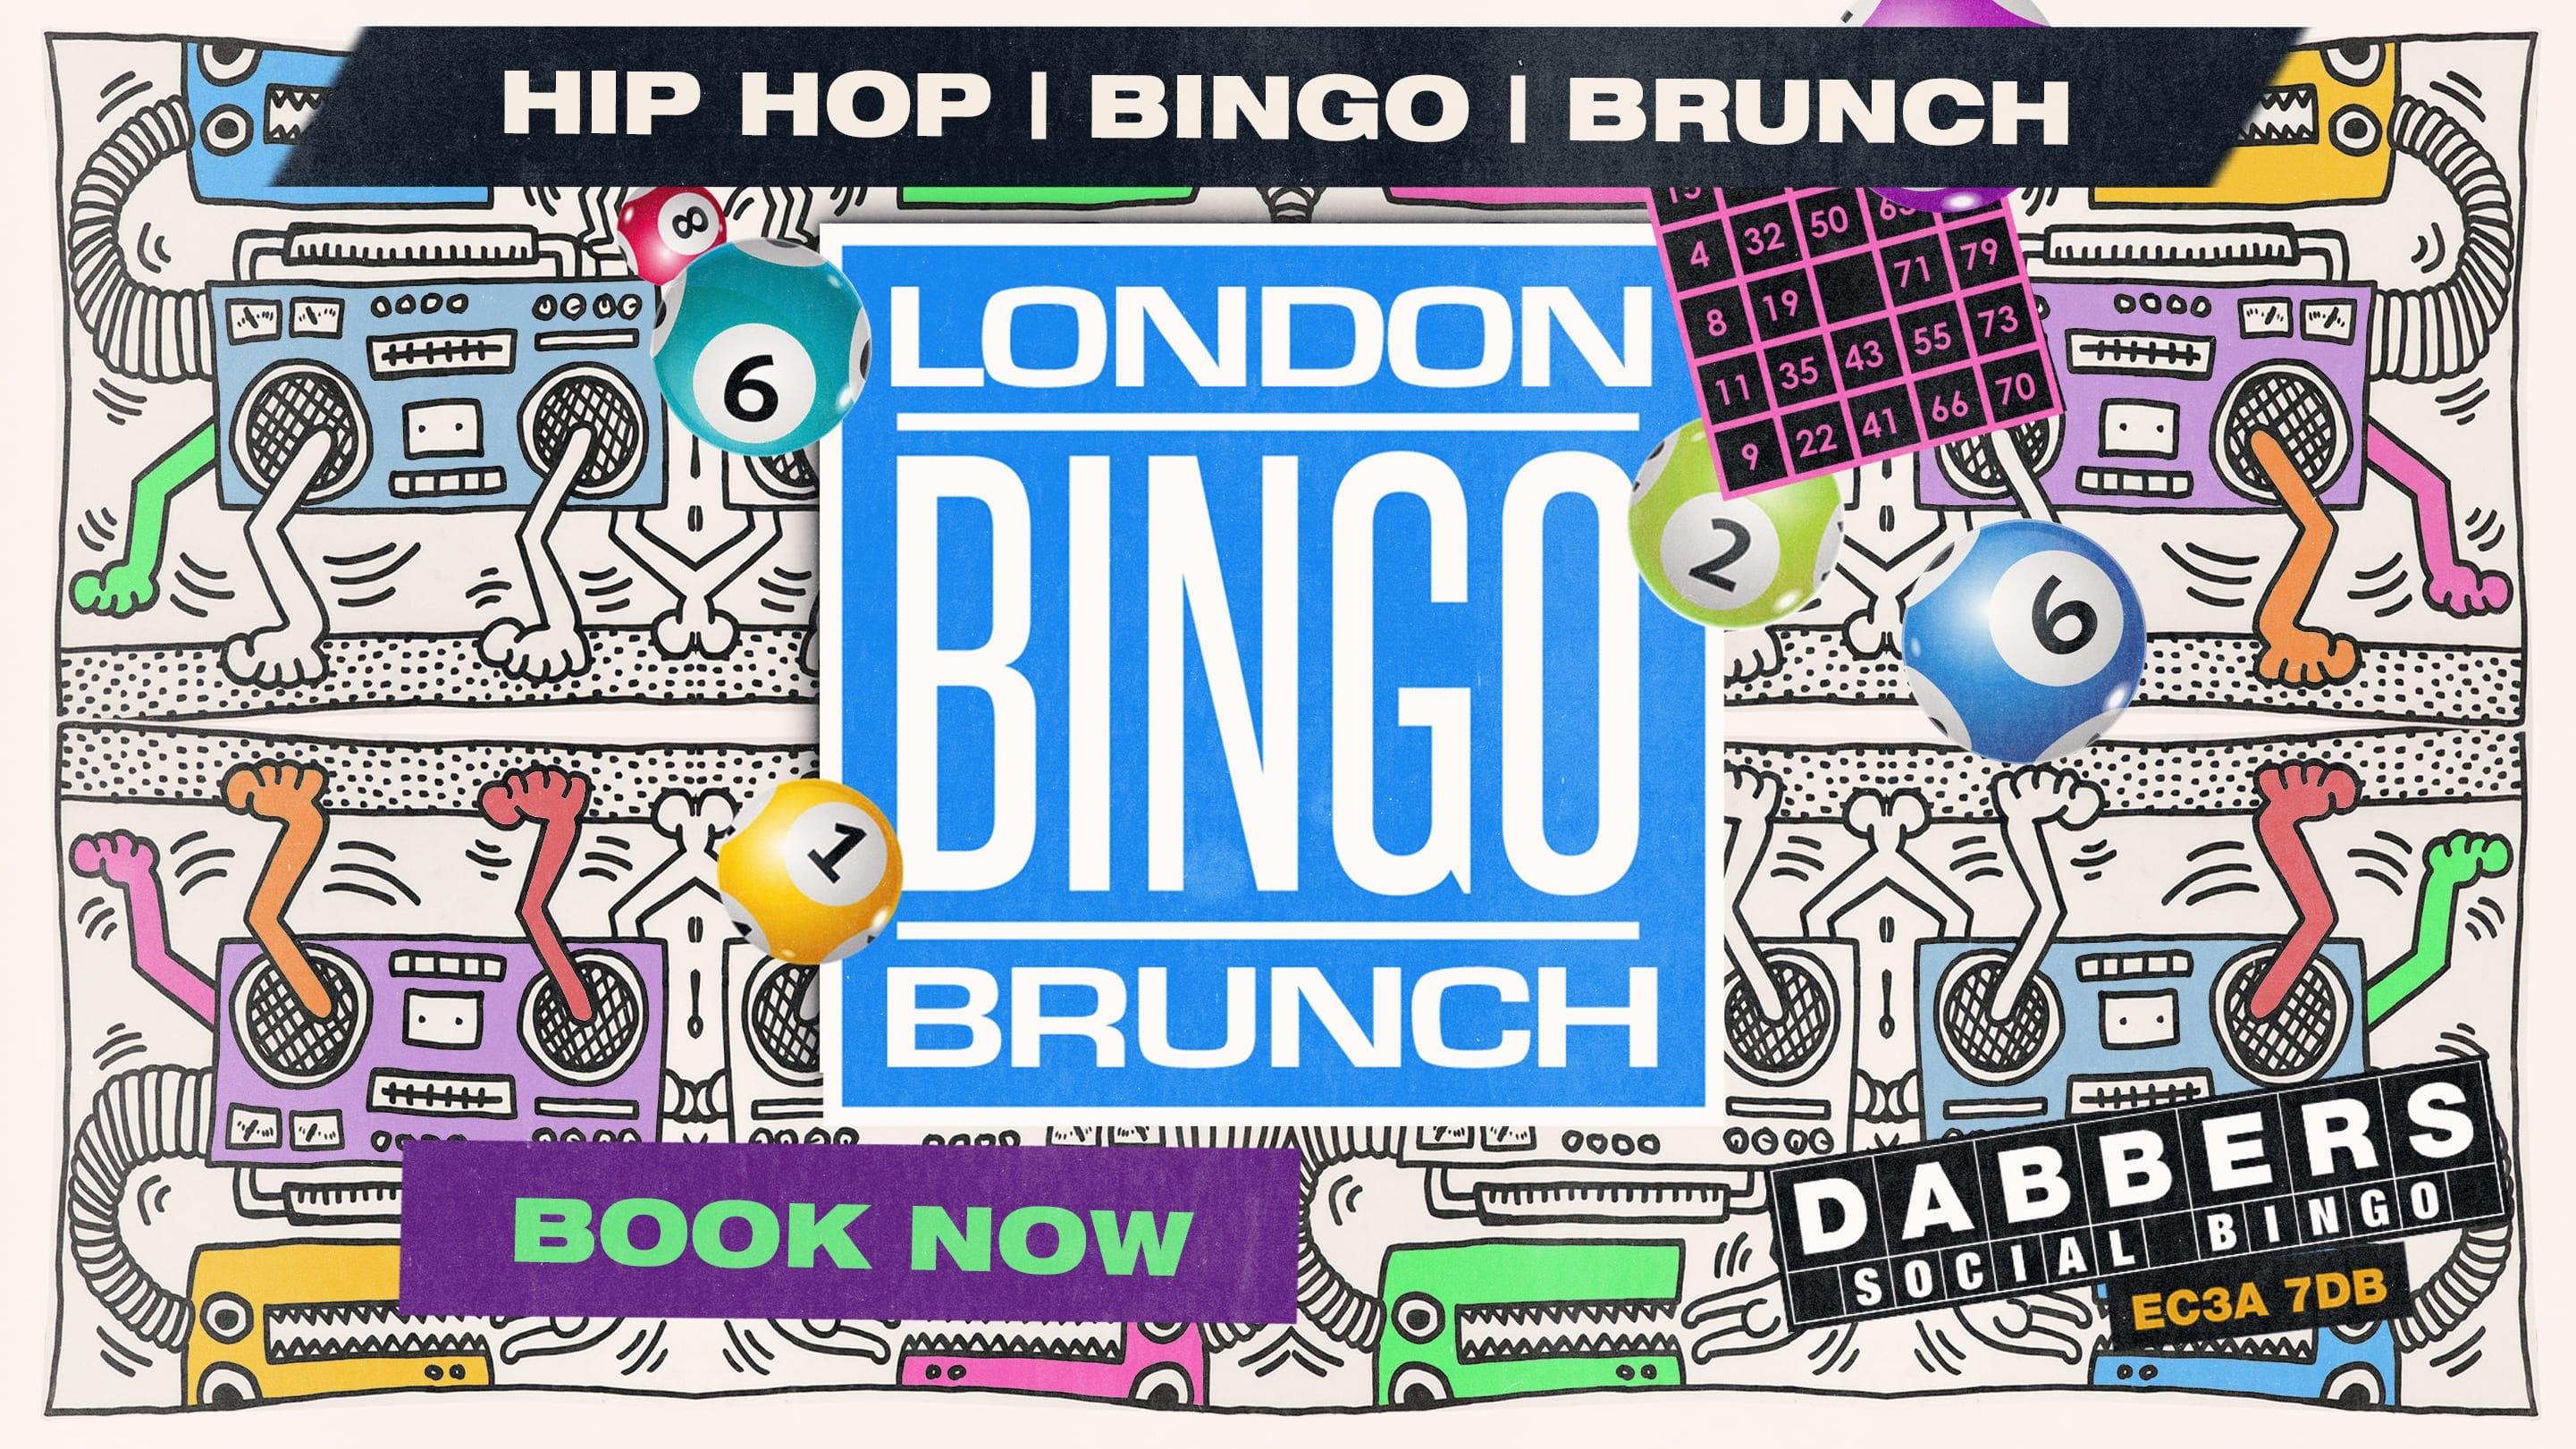 London Bingo Brunch: All Day Hip Hip Party